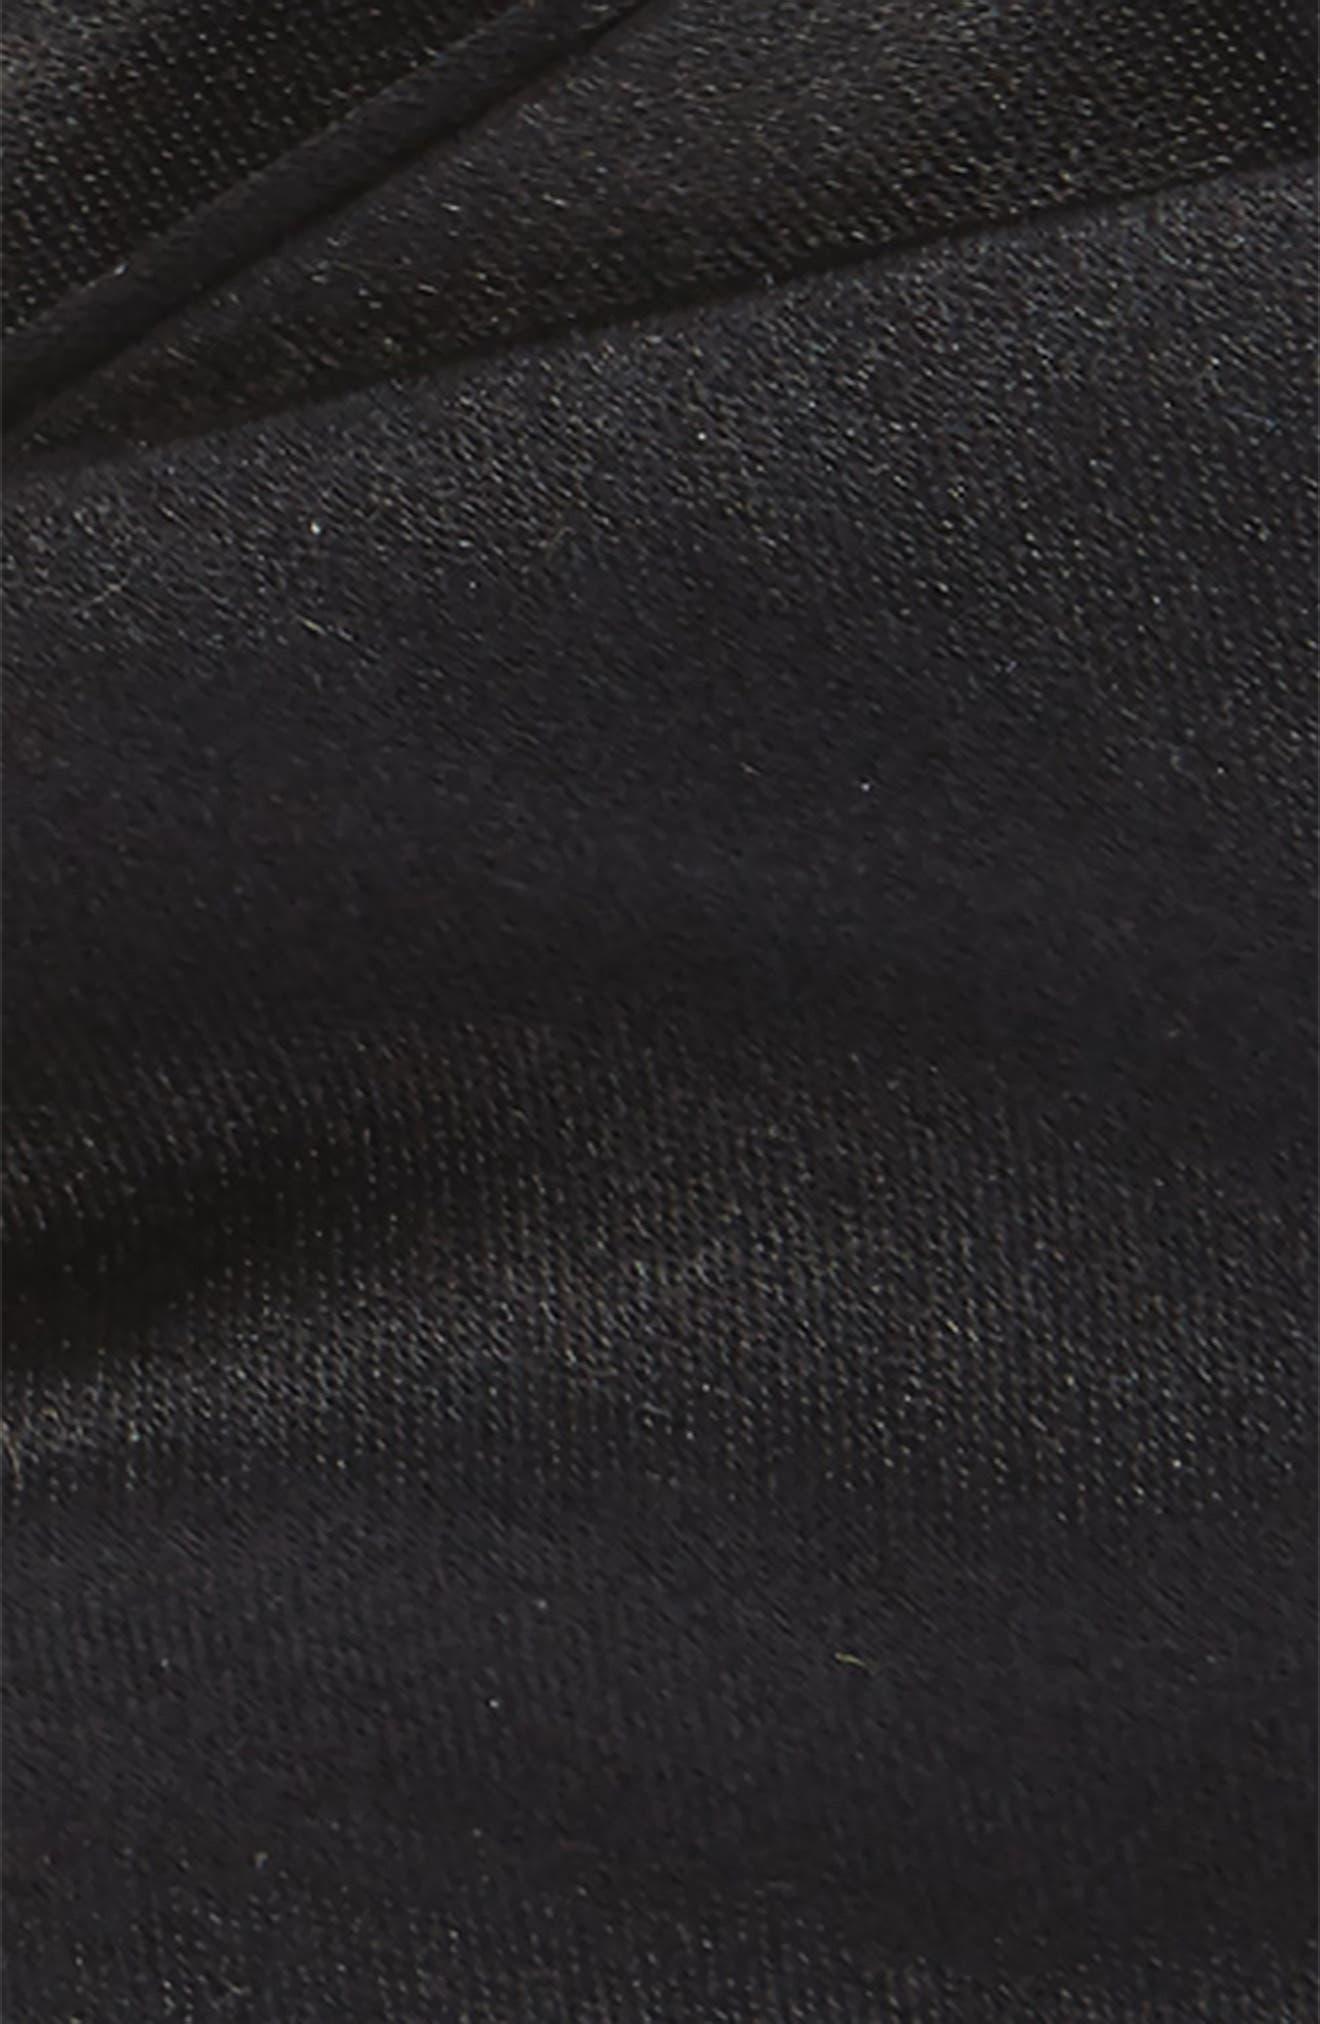 Solid Satin Silk Bow Tie,                             Alternate thumbnail 3, color,                             Black